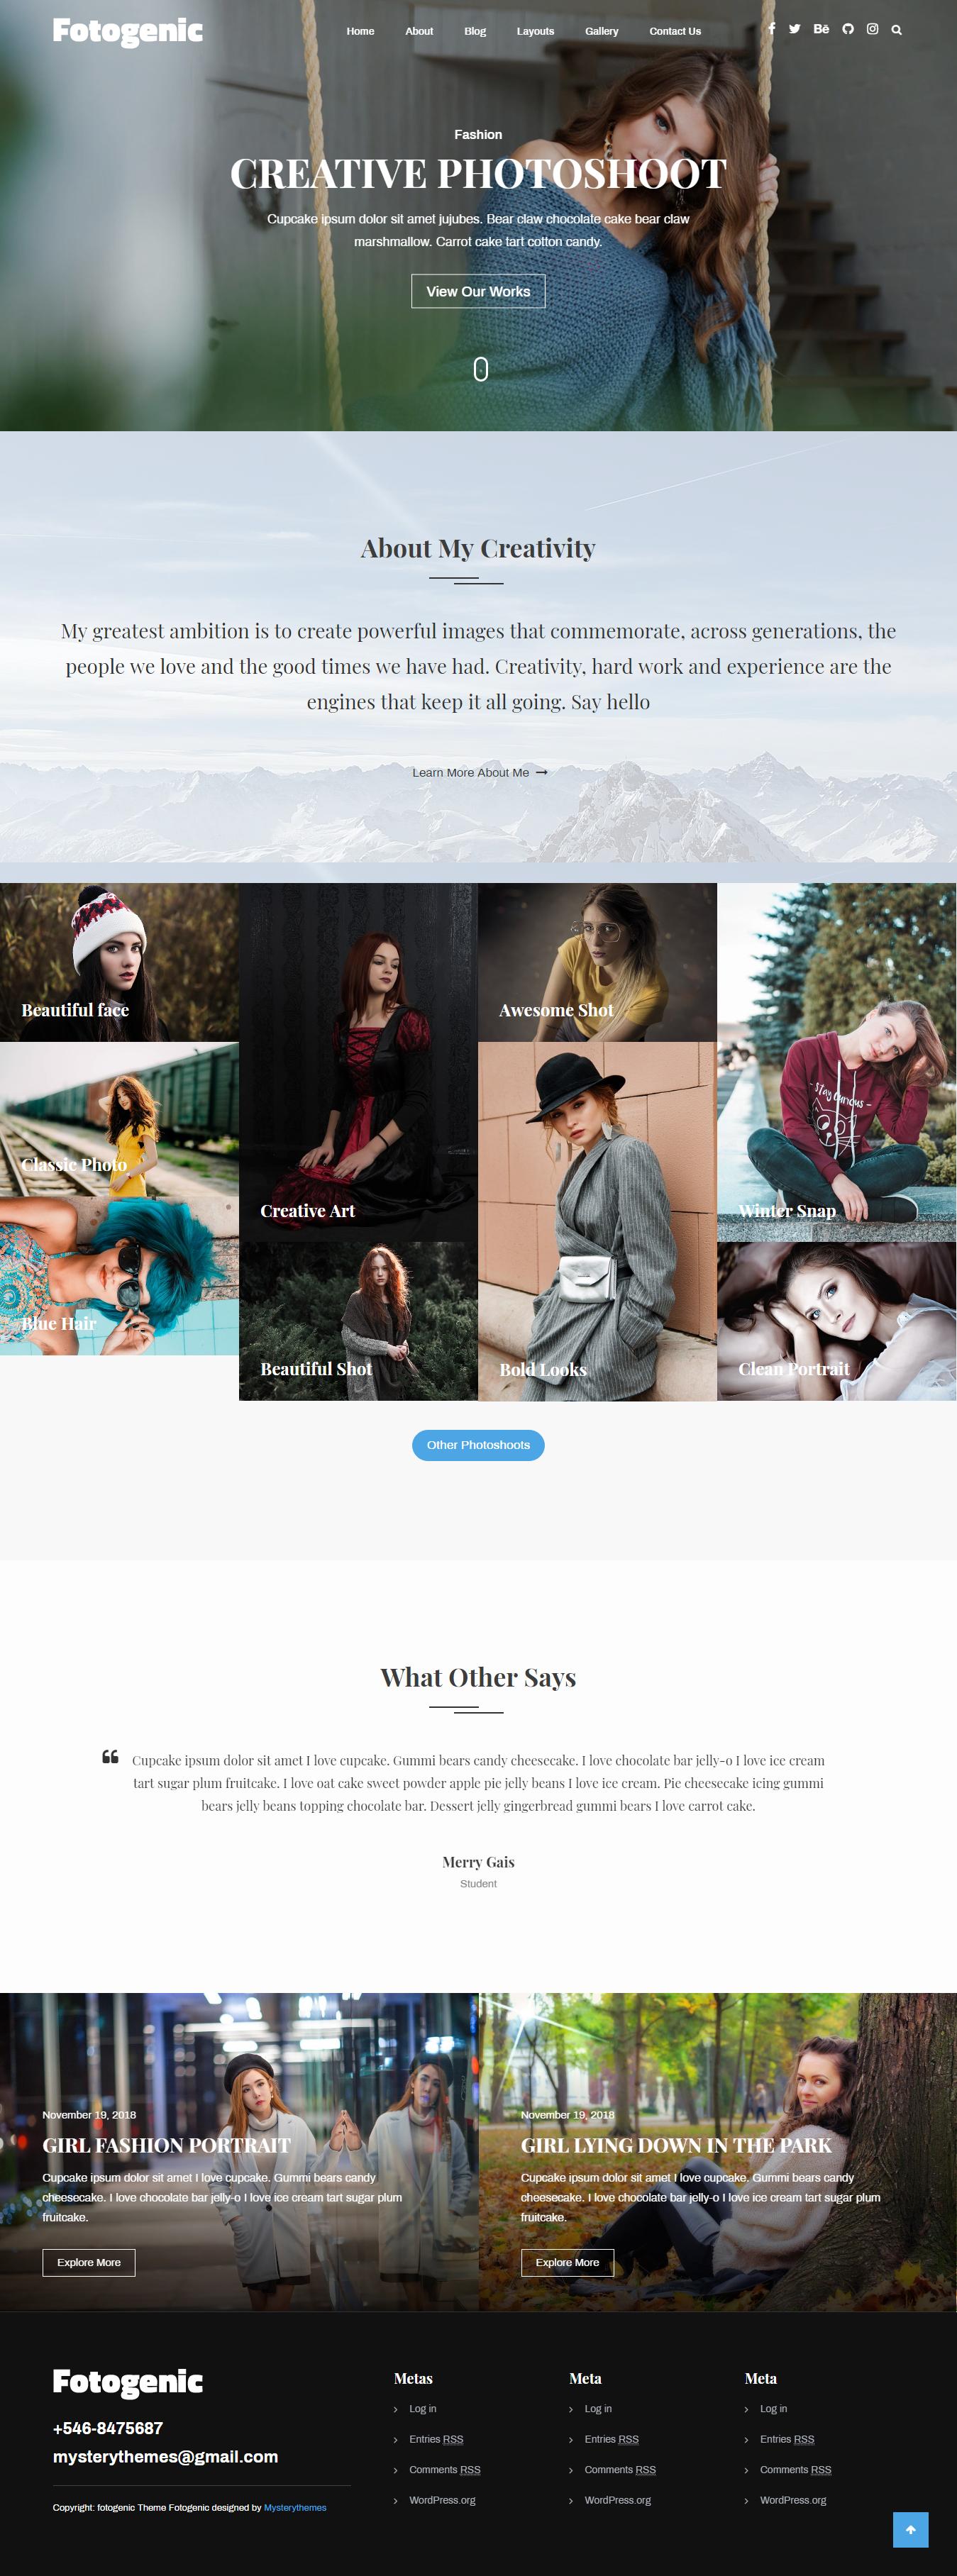 fotogenic best free gallery wordpress theme - 10+ Best Free Gallery WordPress Themes